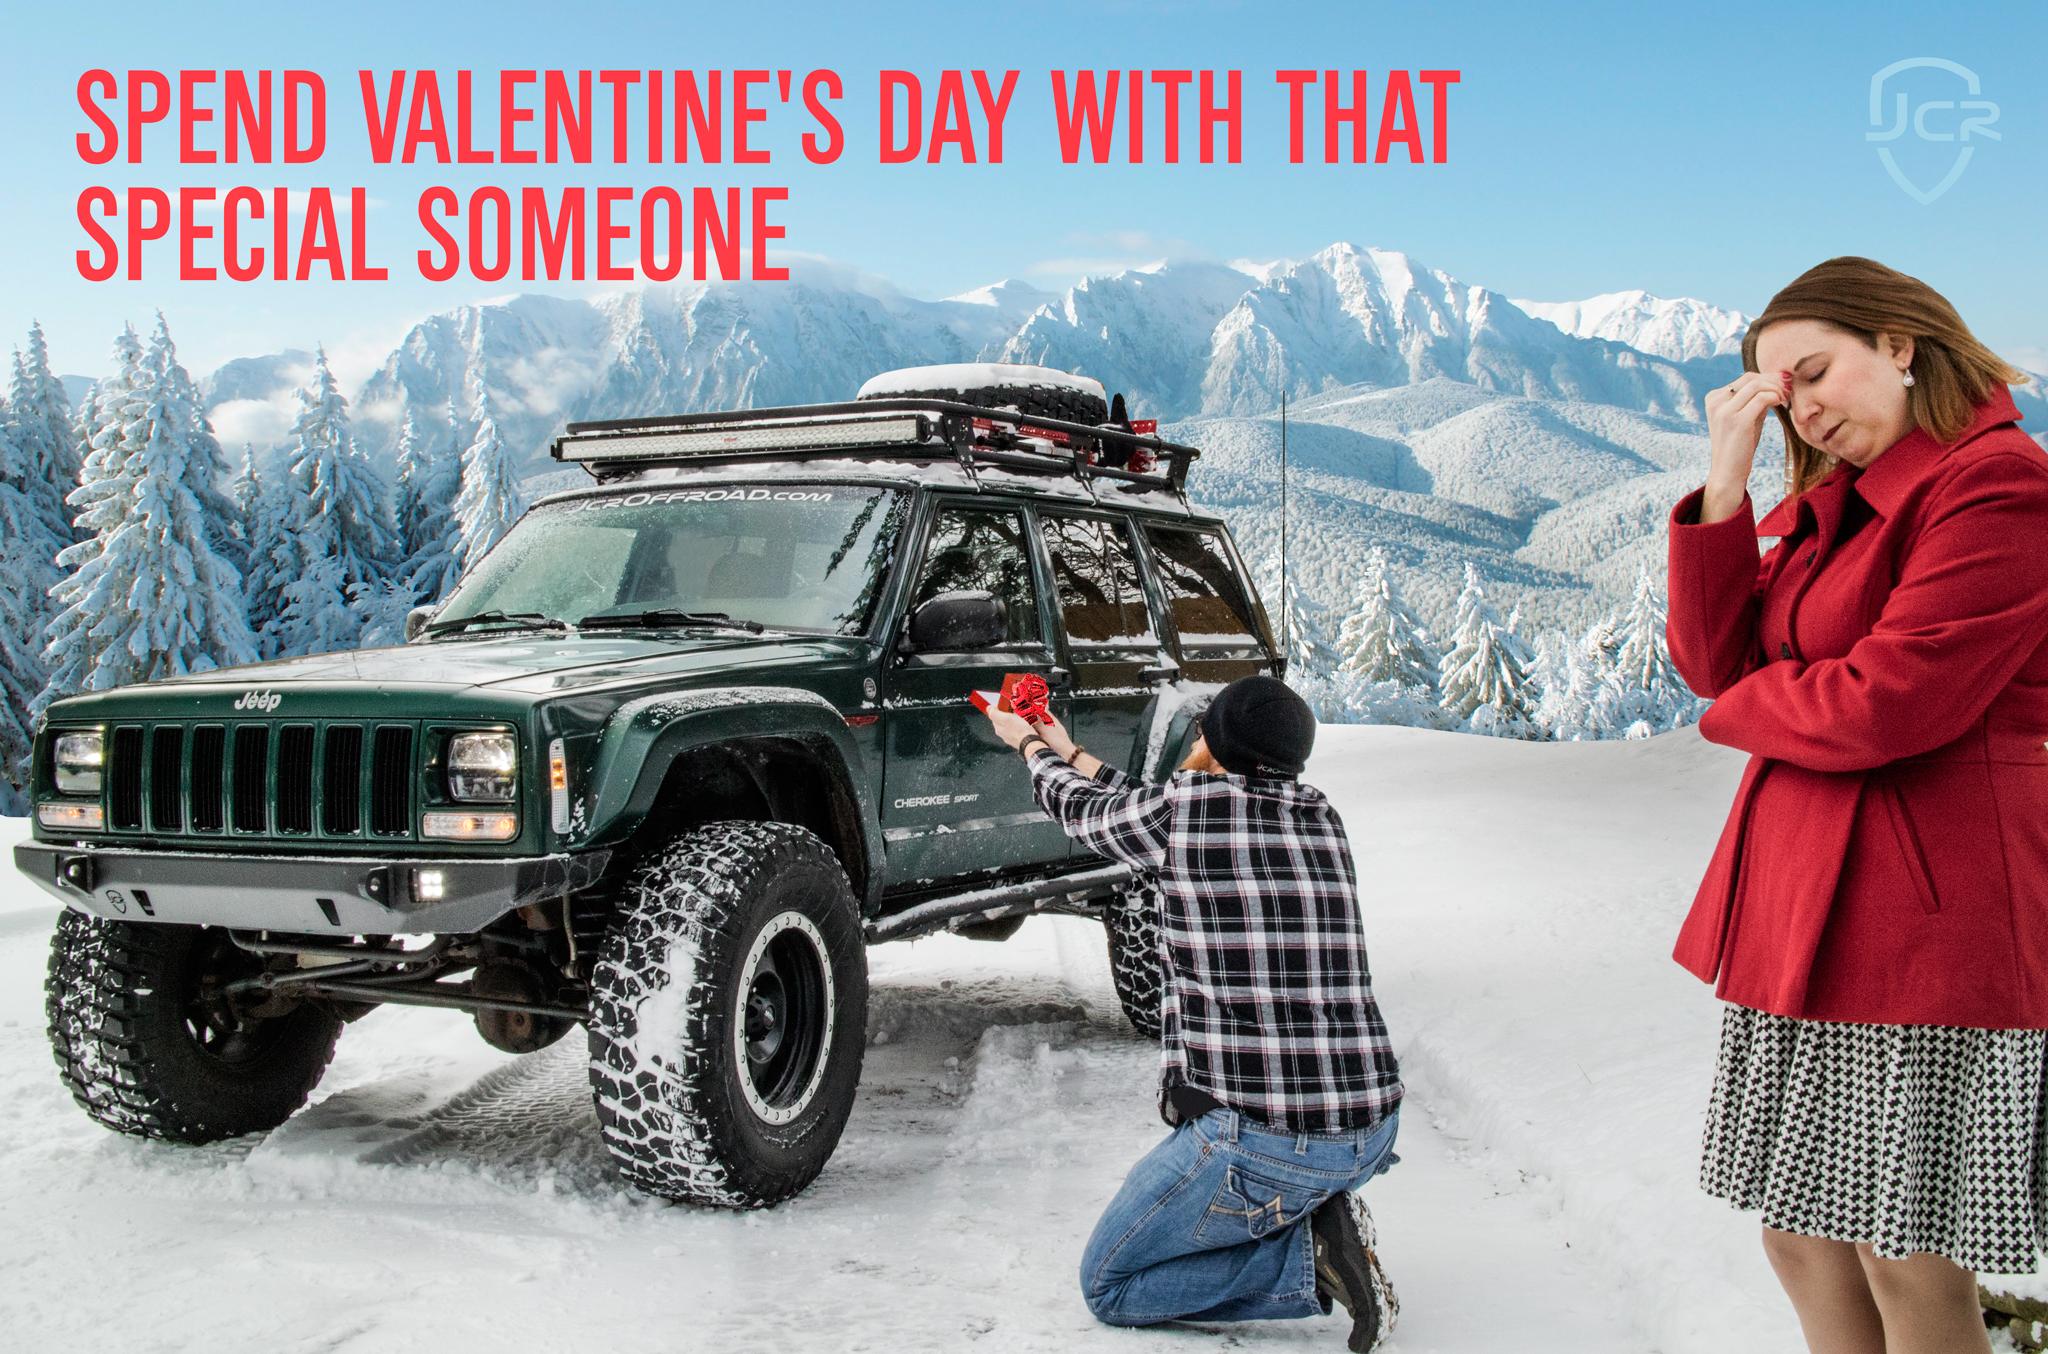 jcr-valentines-day